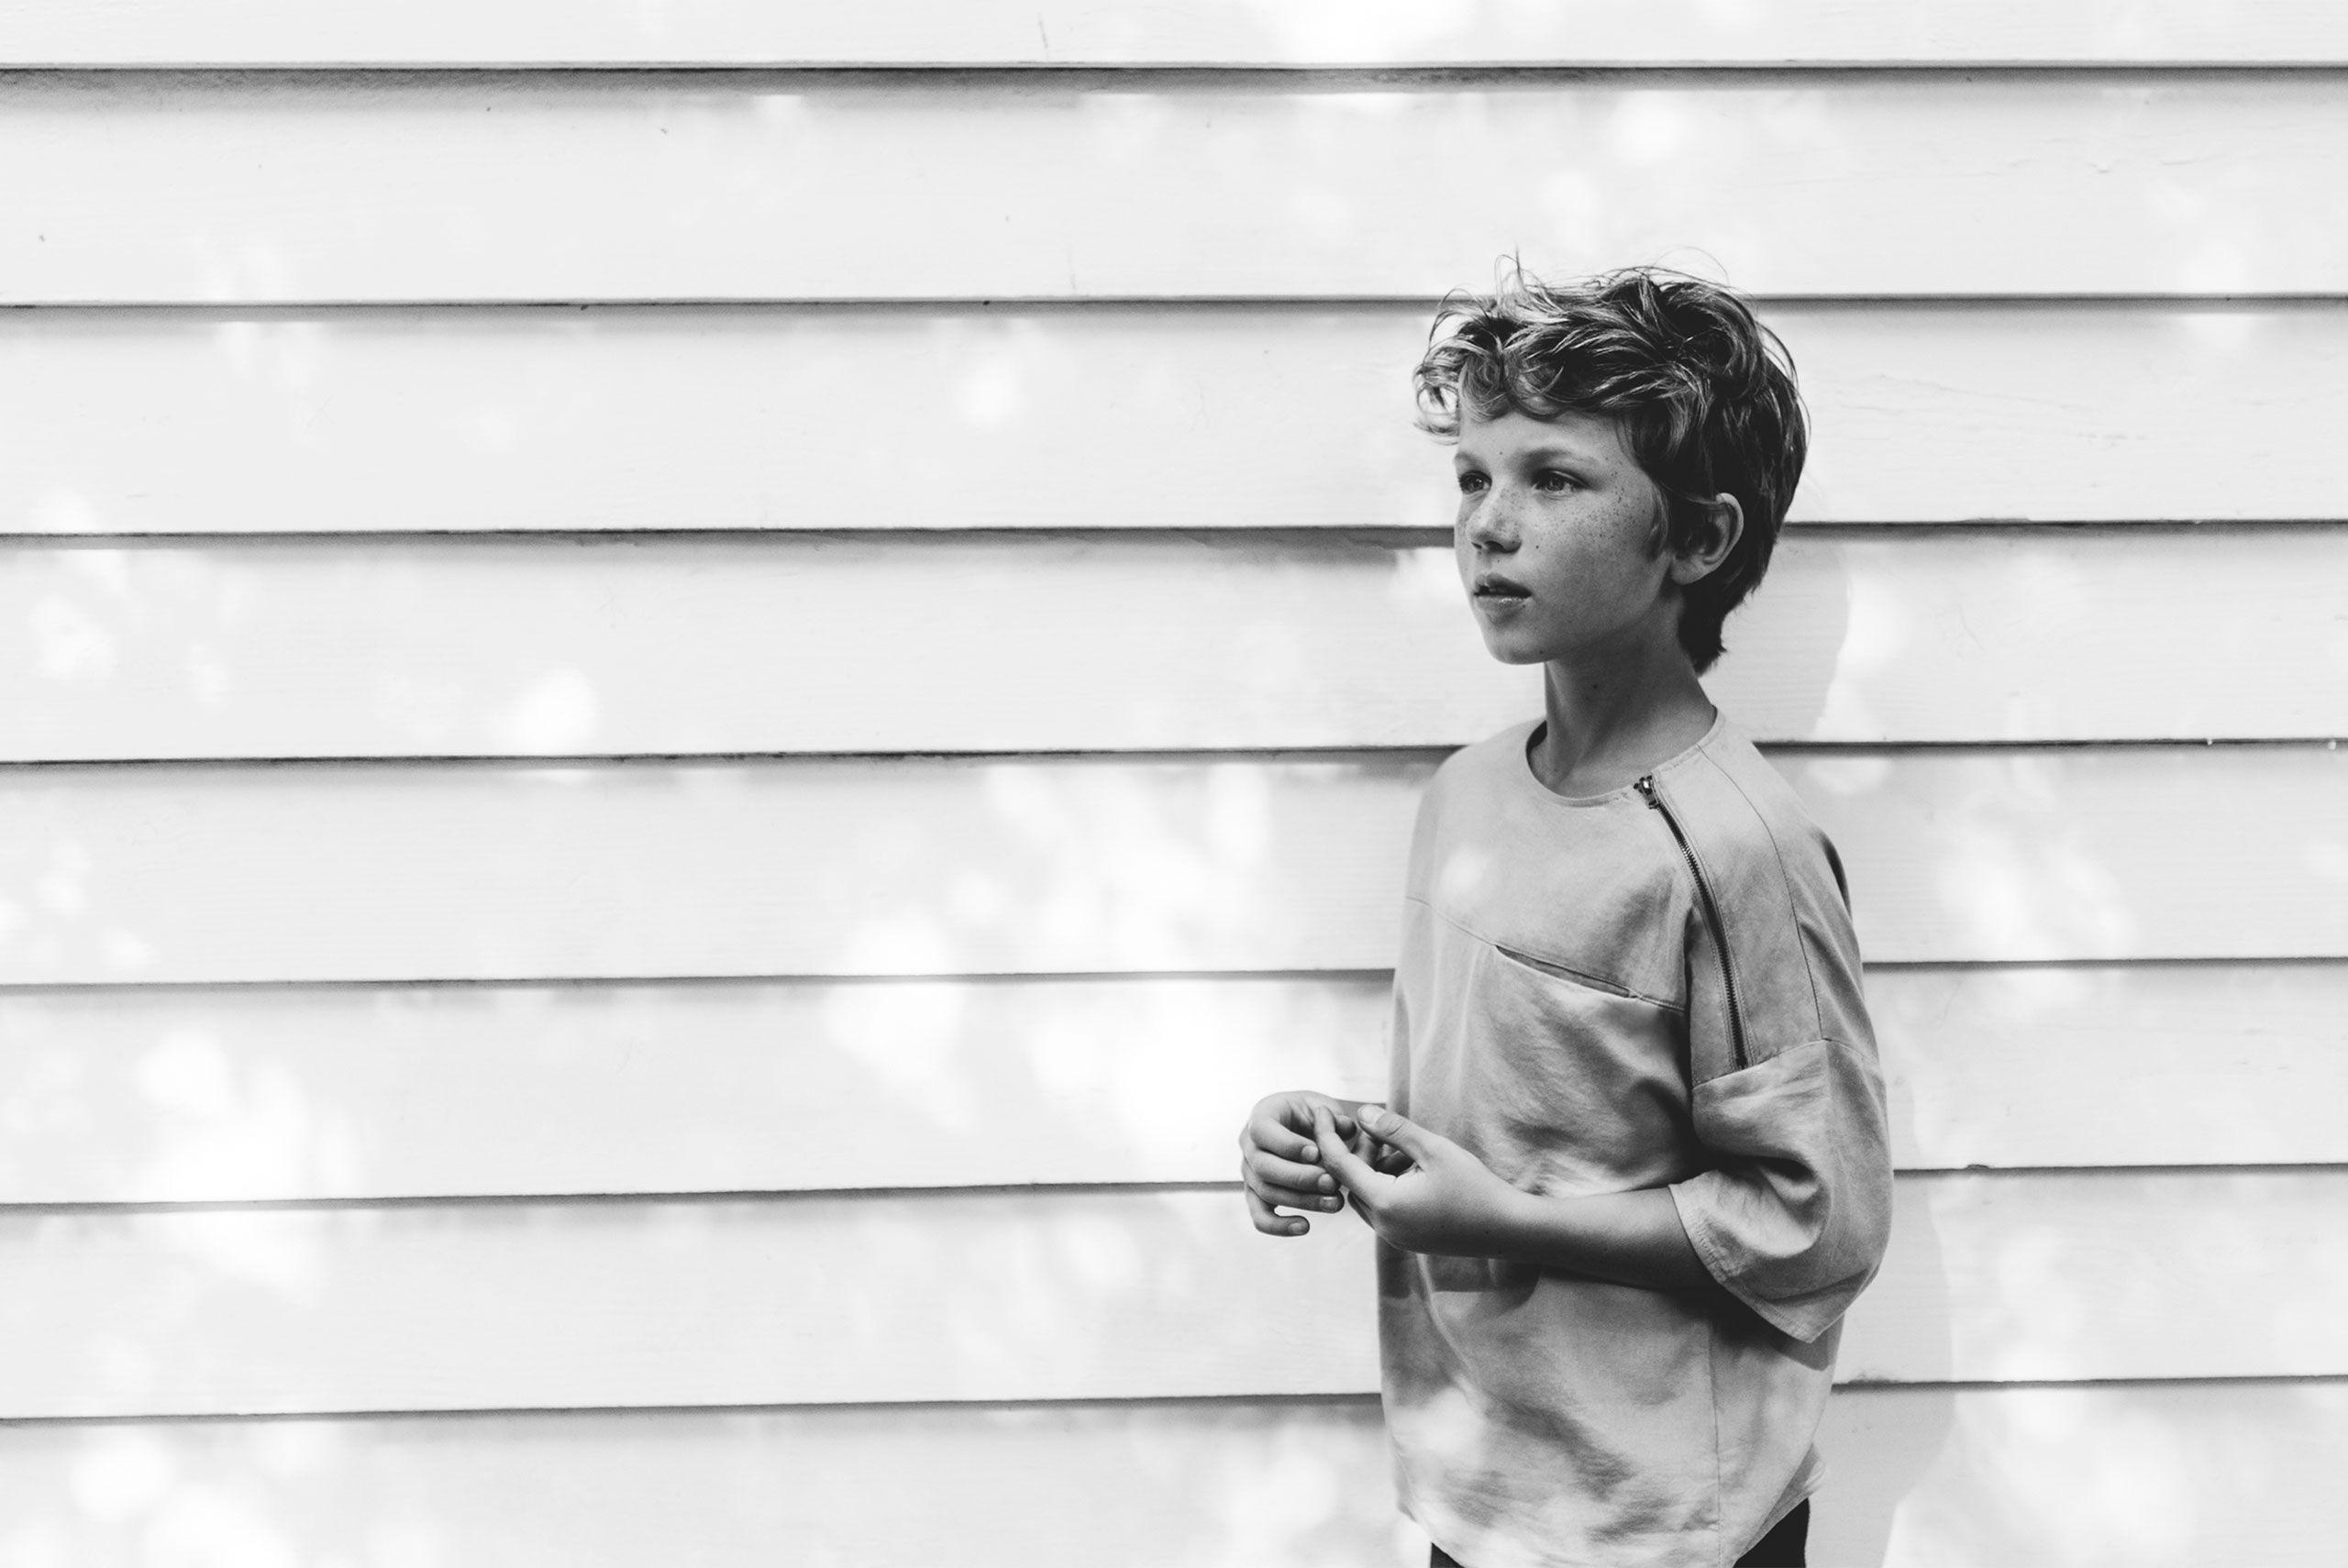 ZARA - #zaraeditorial - KIDS - CAPSULE COLLECTION | BOY